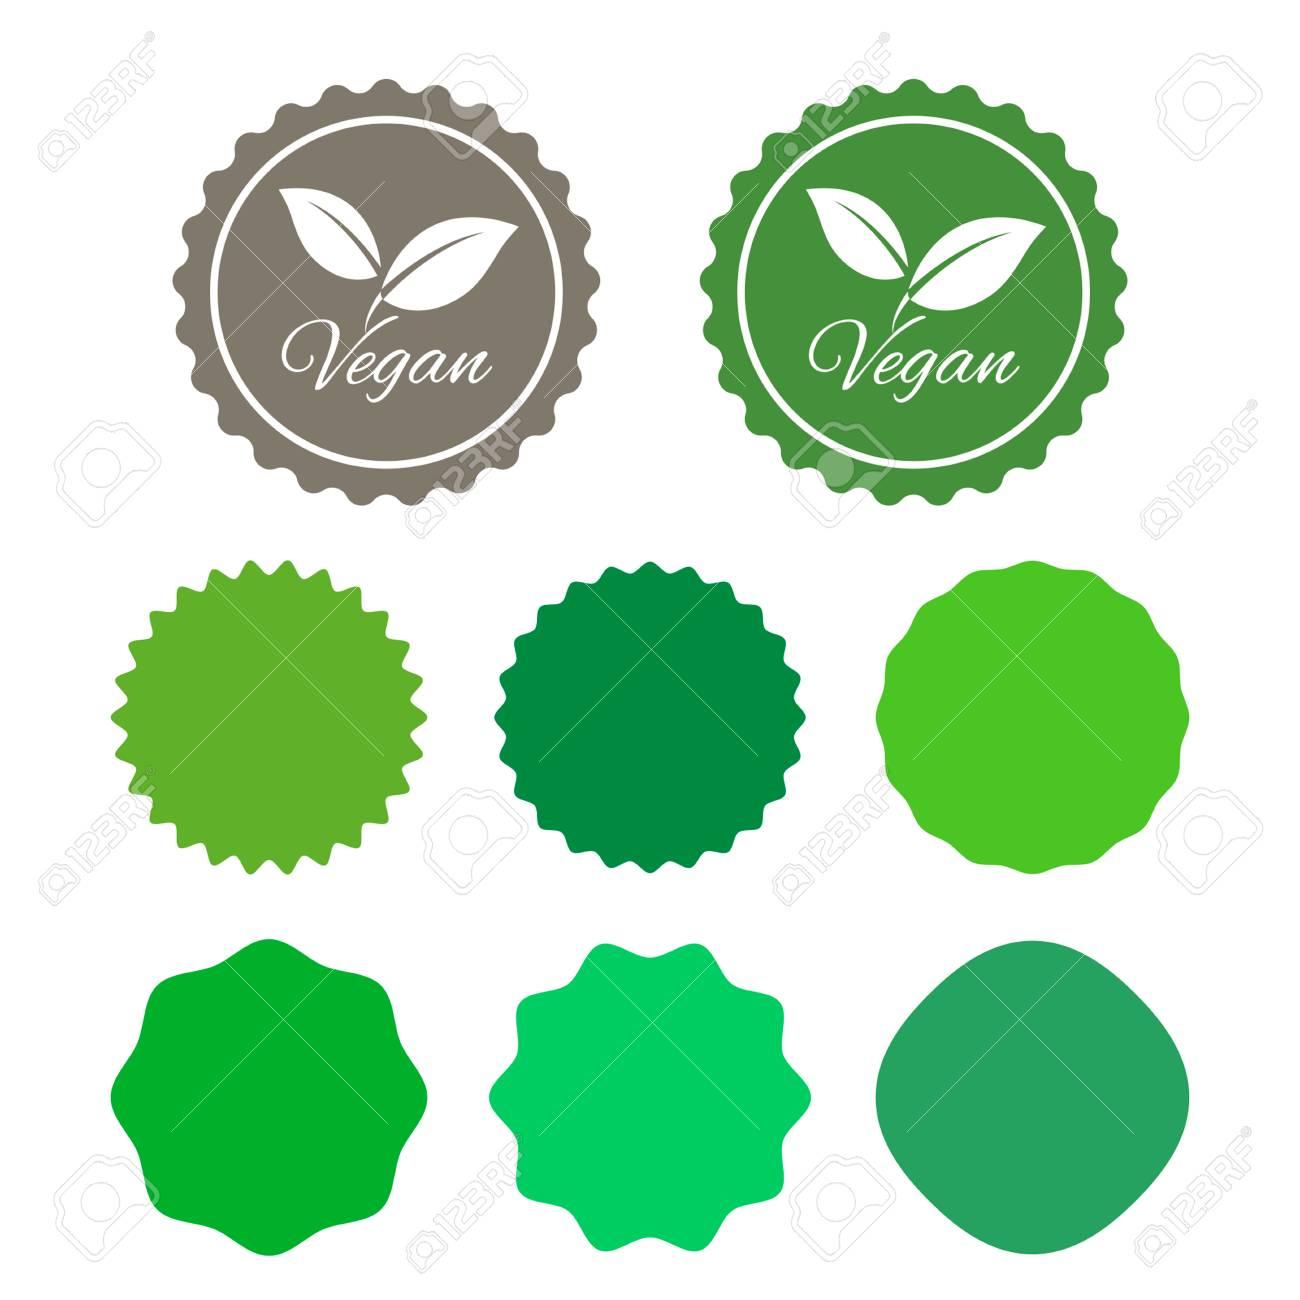 Vegan stickers design template set